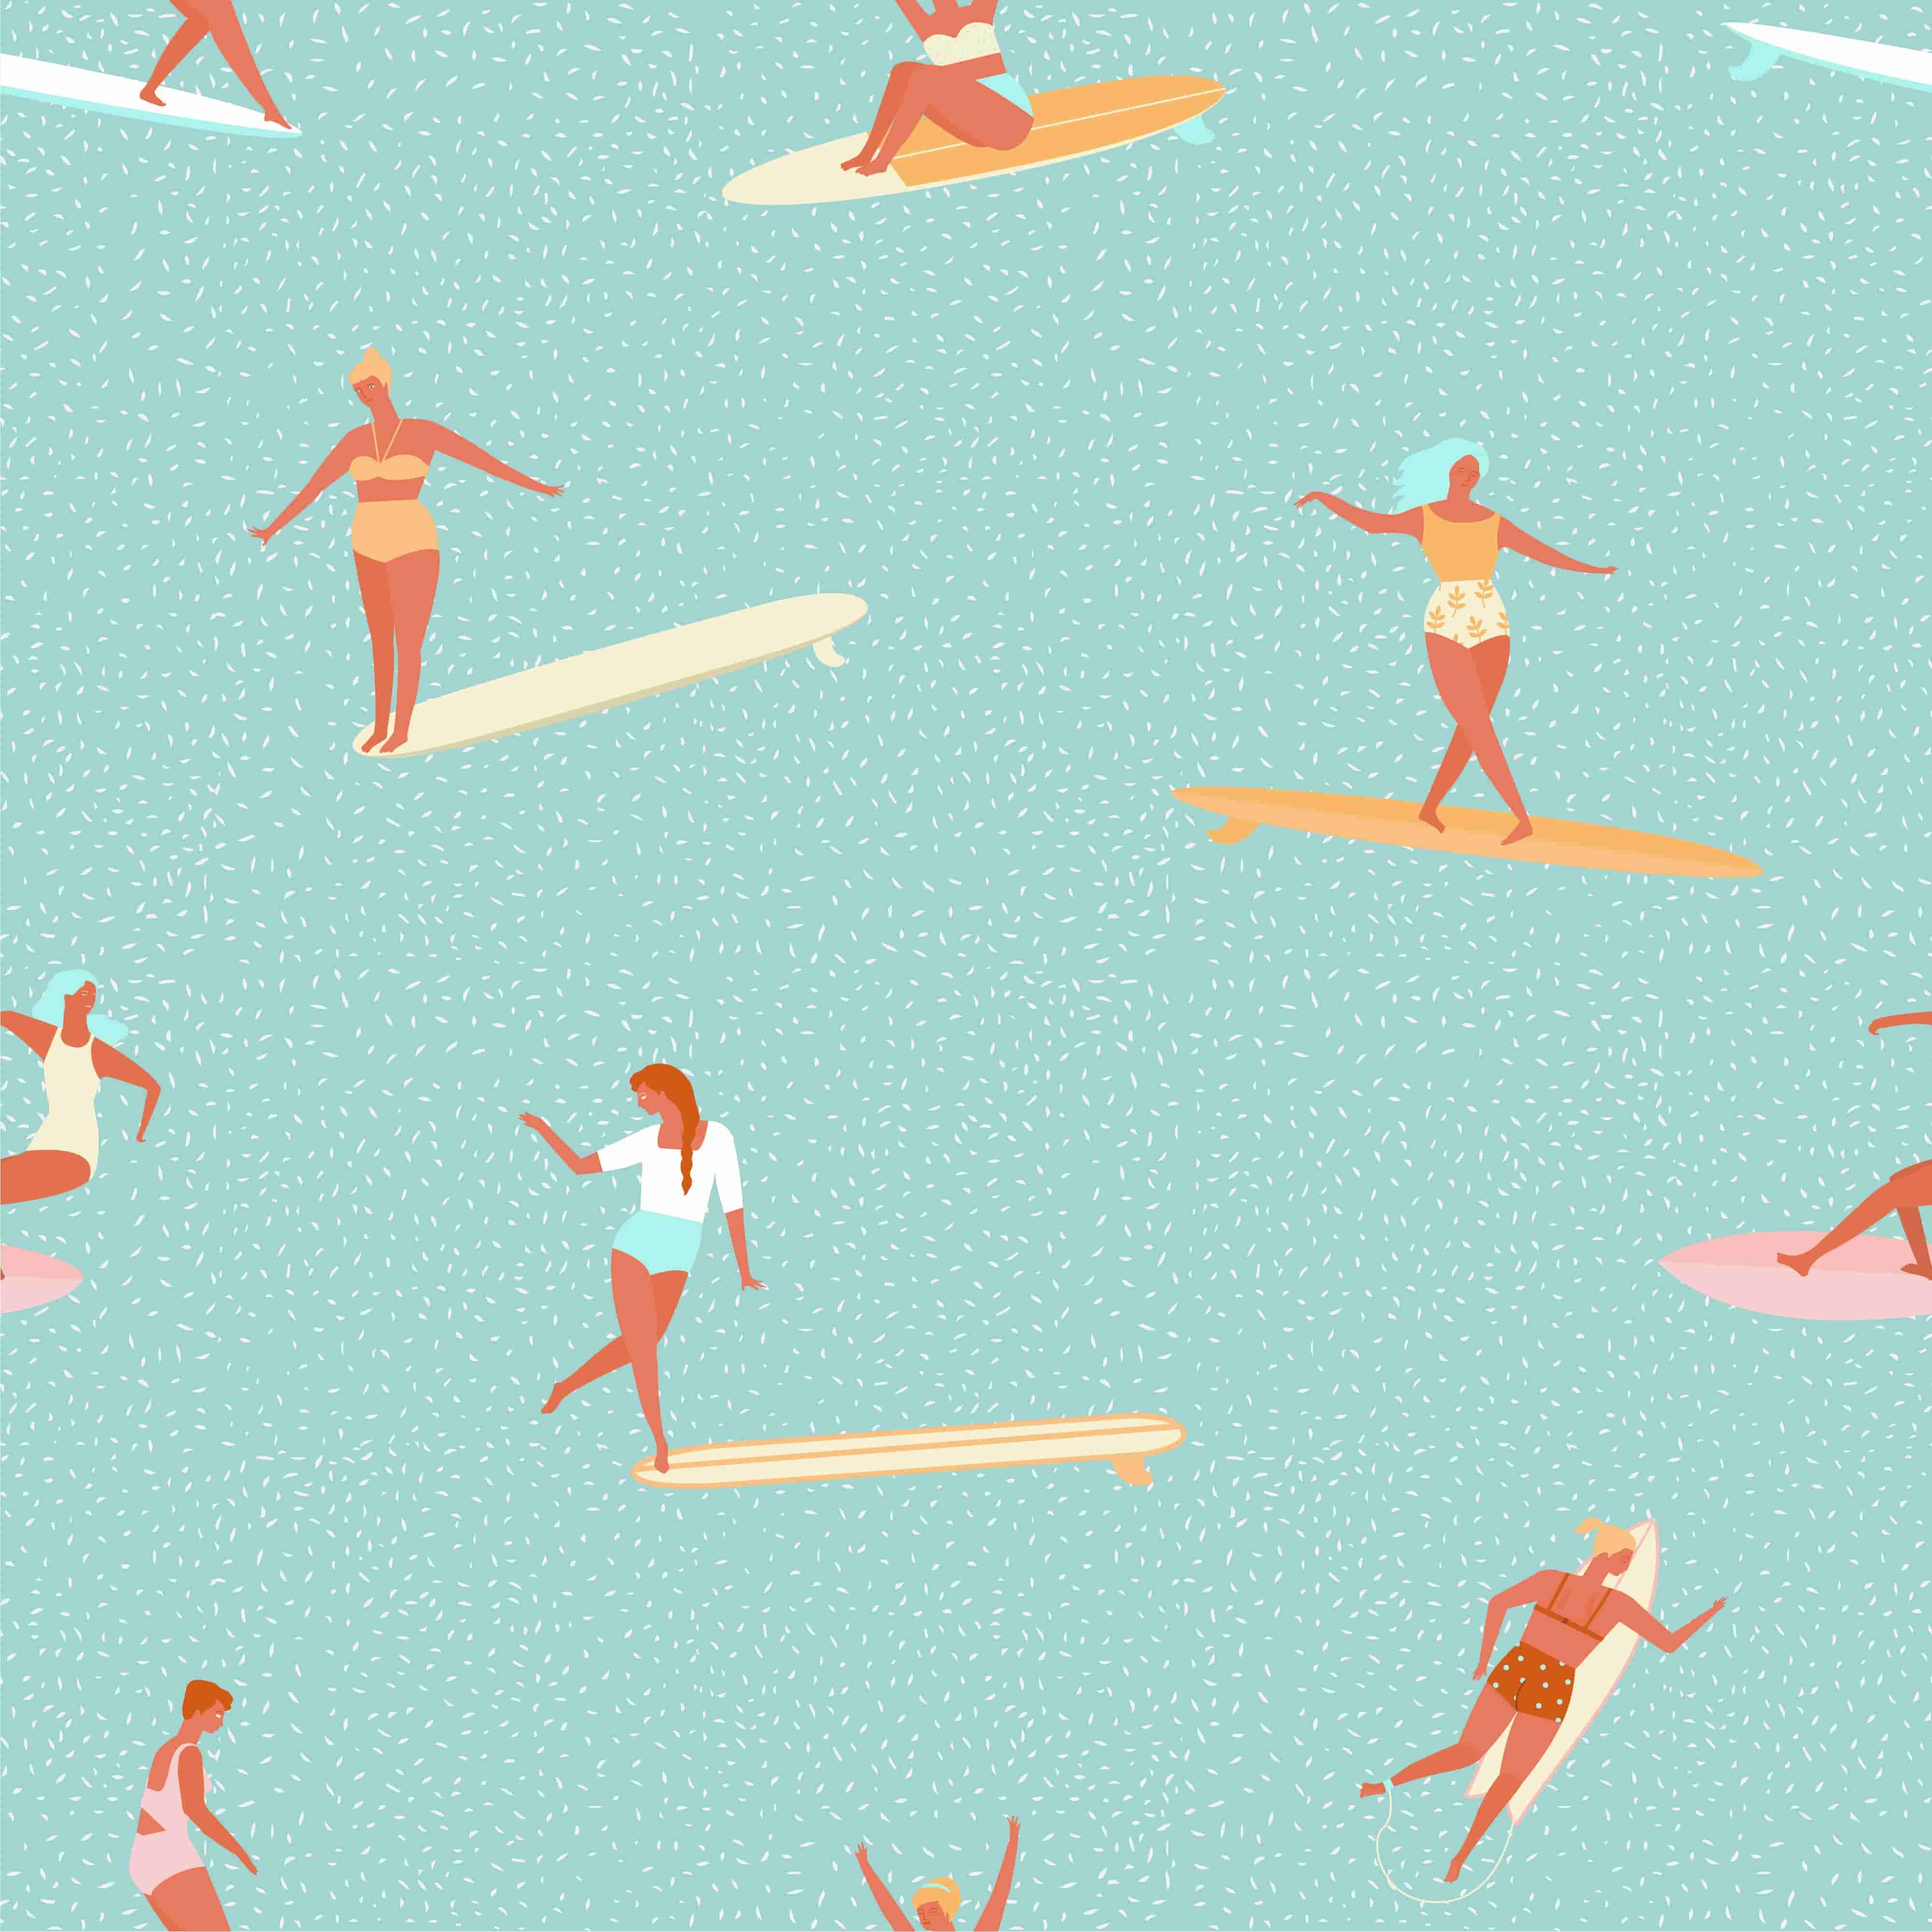 kaiku-sin-lactosa-dia-mundial-bikini-vacaciones